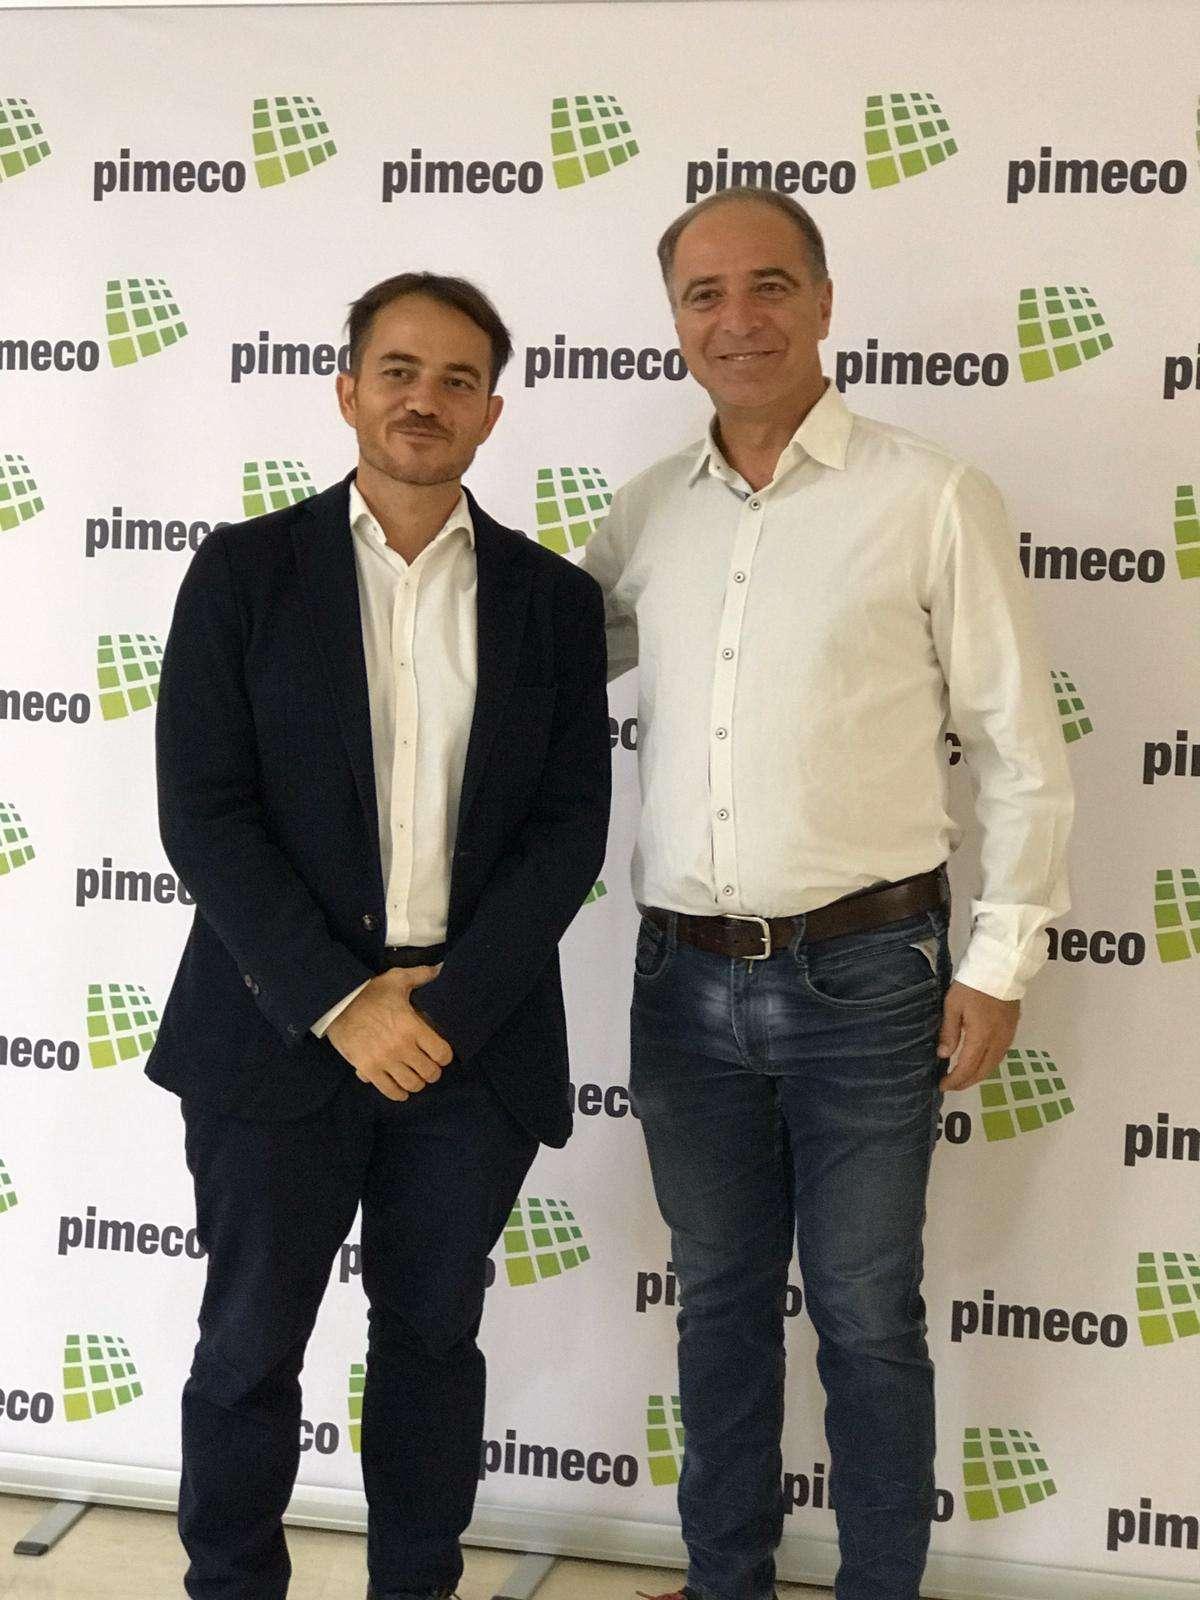 PIMECO FICHA AL GUIONISTA ERNEST RIERA PARA GRABAR UN CORTOMETRAJE